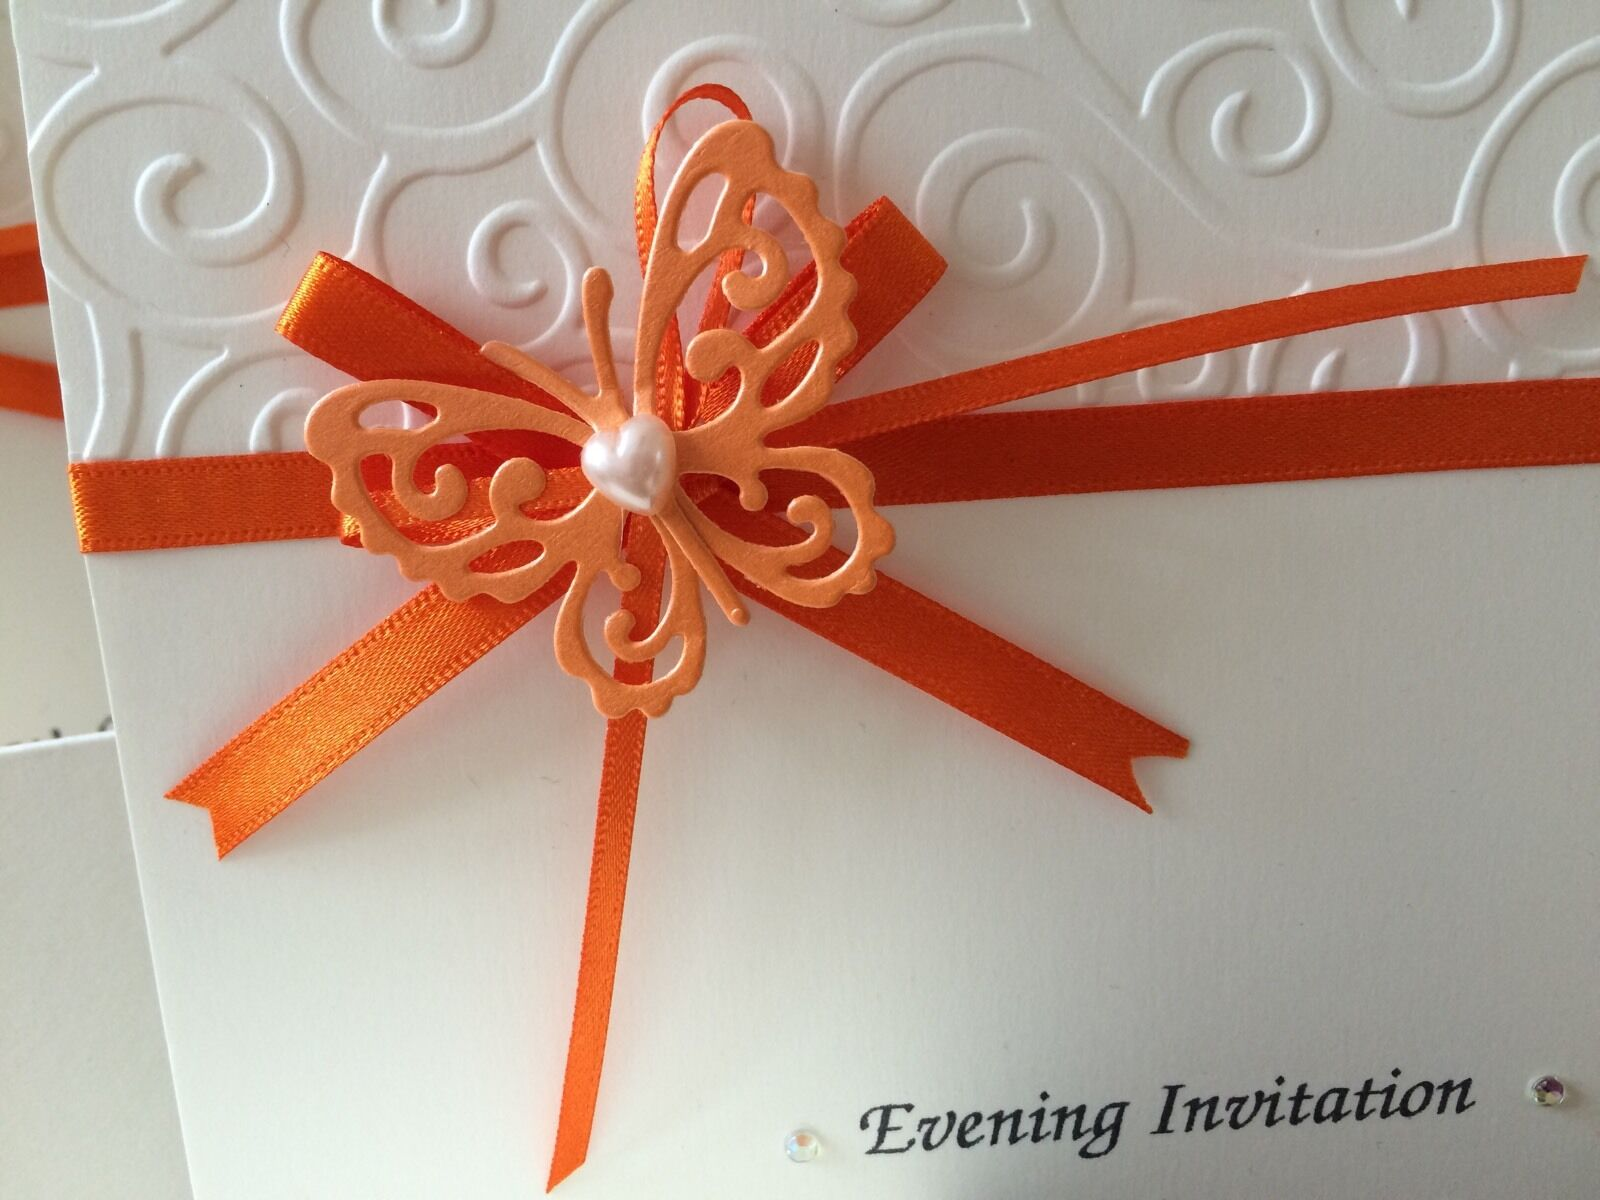 10 X Handmade Tattered Lace Butterfly Wedding Invitations | eBay